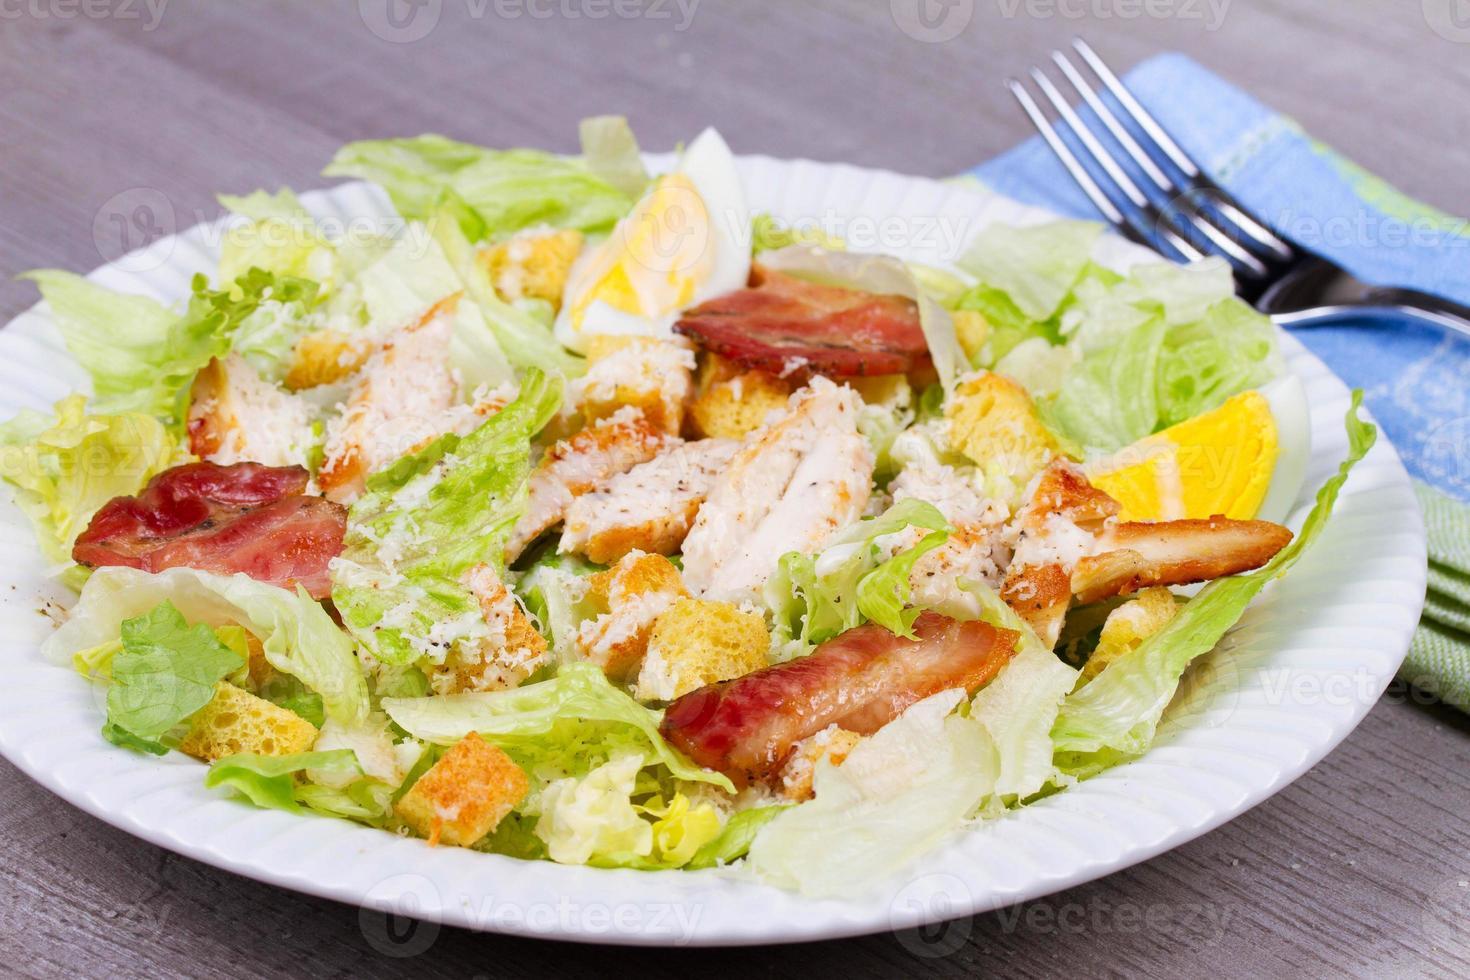 Caesar Salad with Chicken and Breadsticks photo